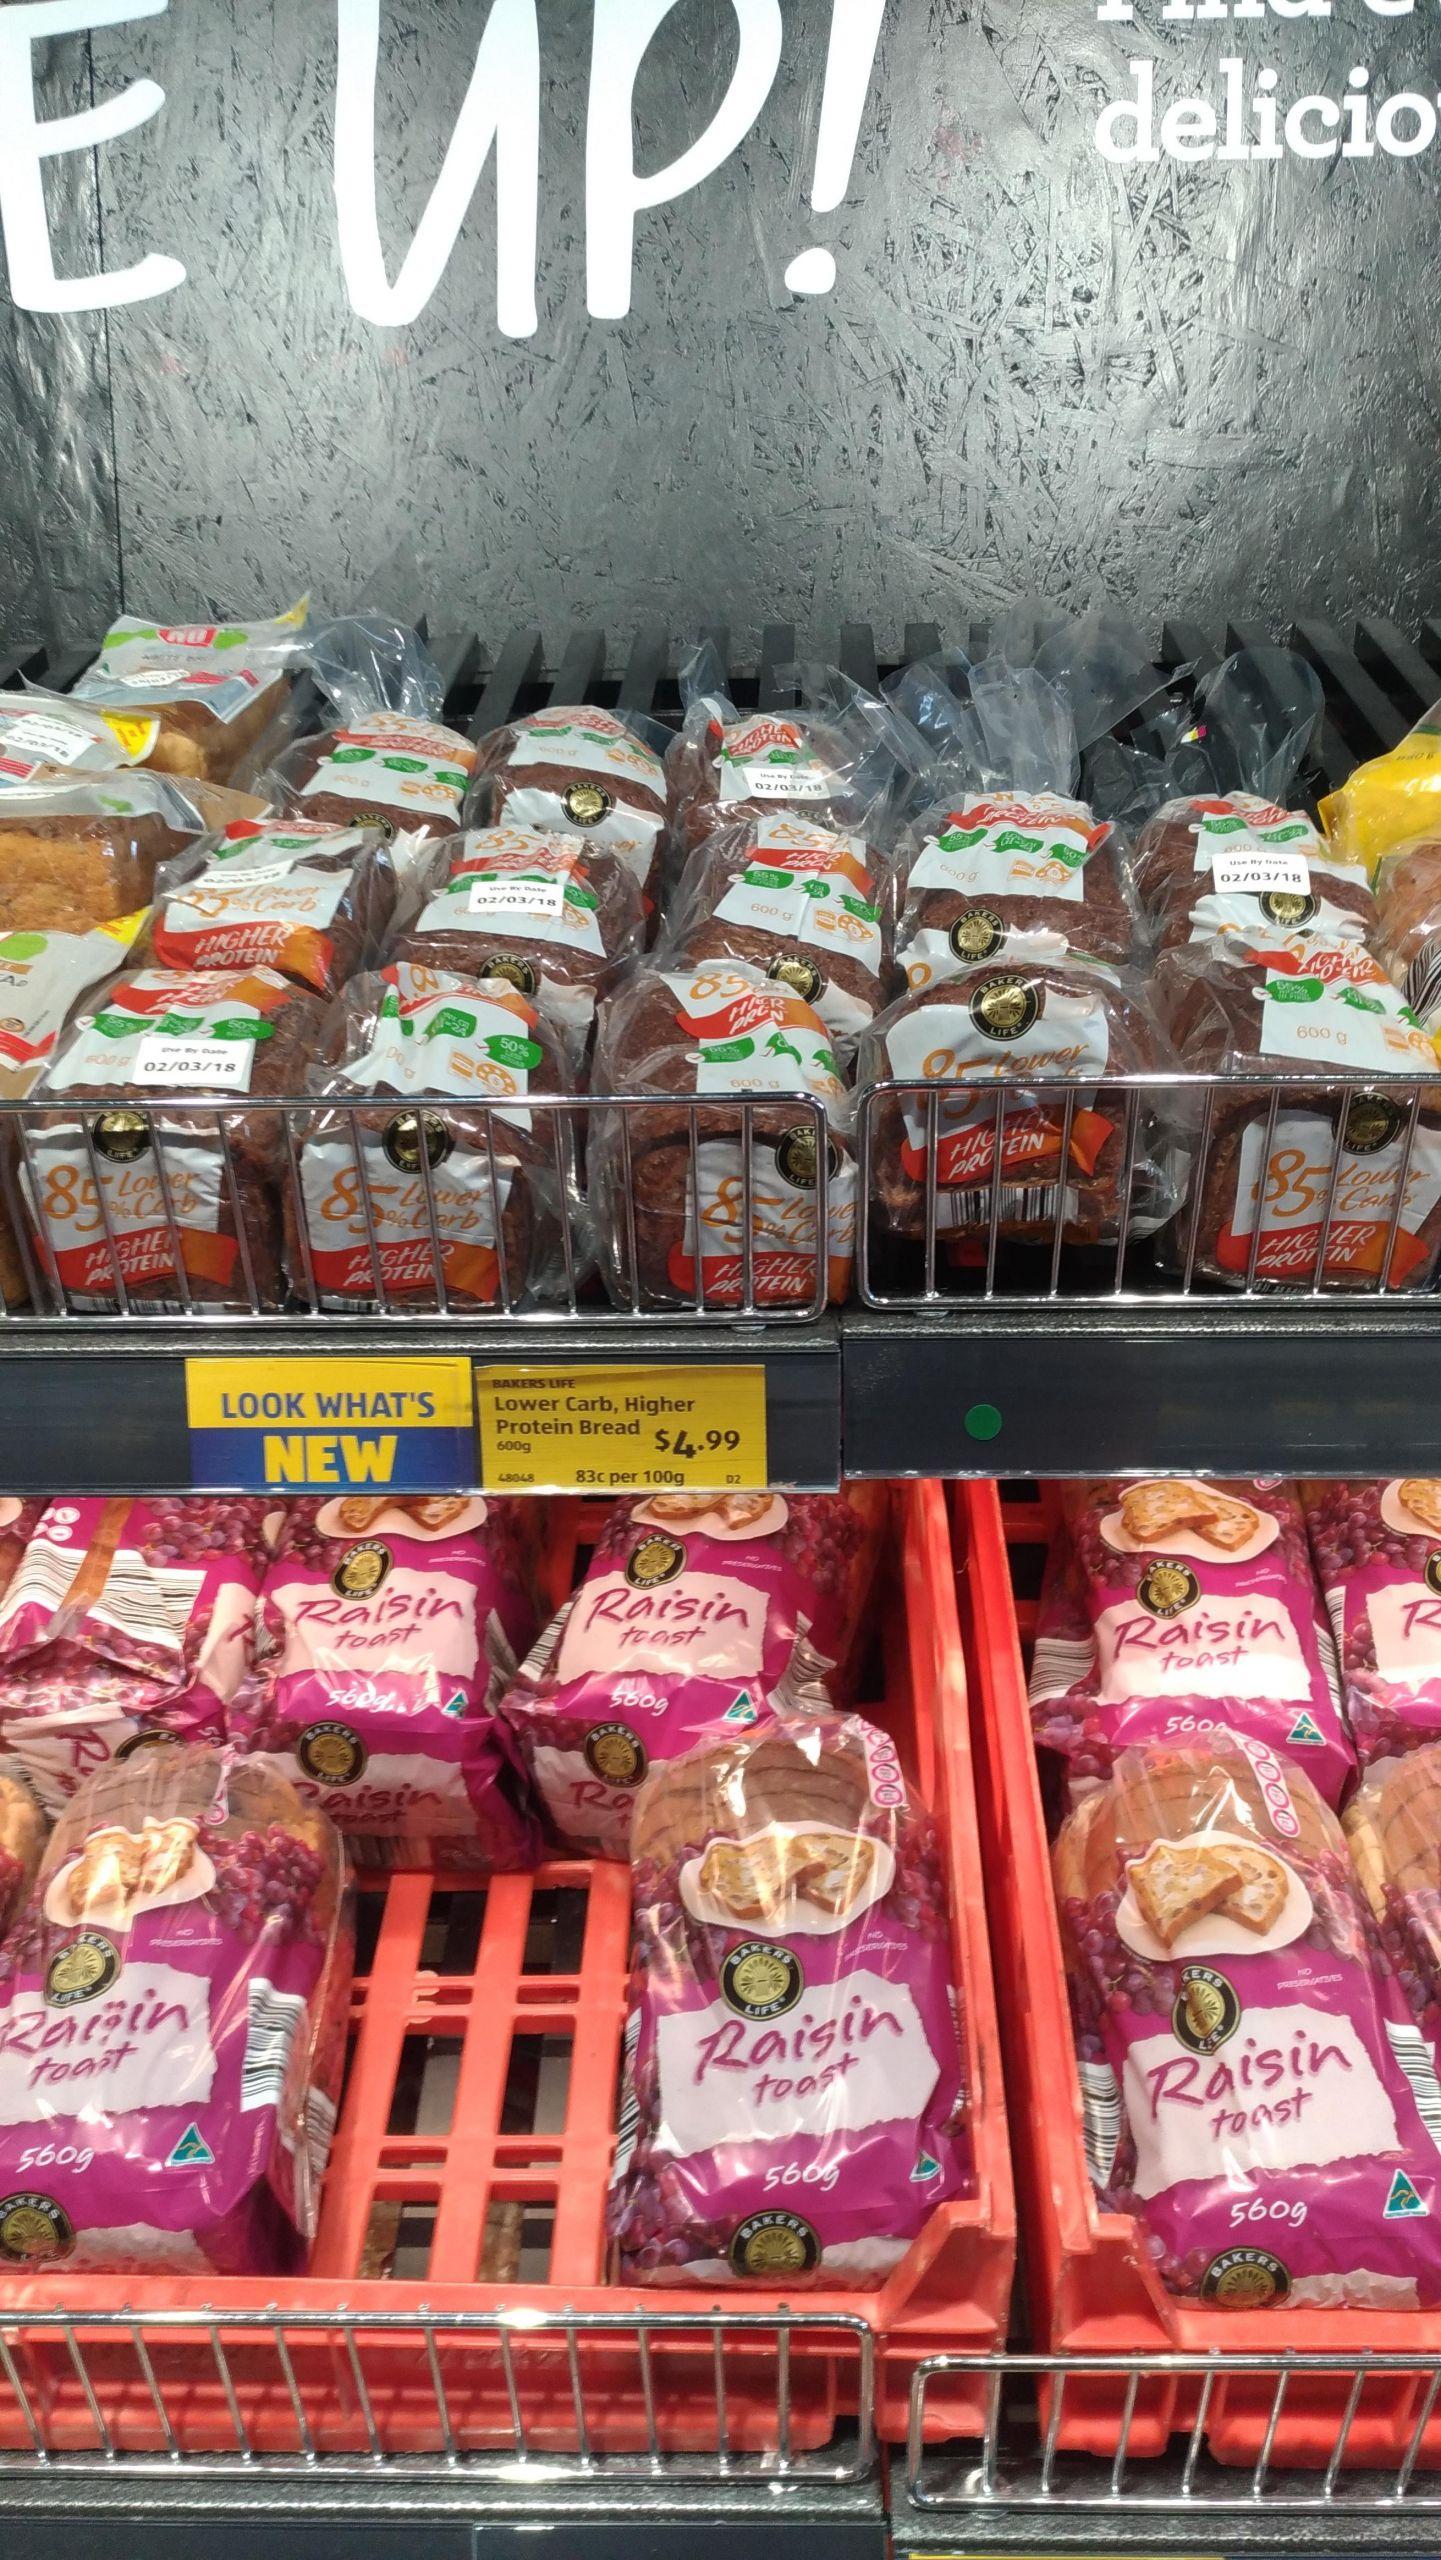 Low Carb Bread In Stores  Aldi Low Carb Bread [5 4g 100g] seen in WA ketoaustralia